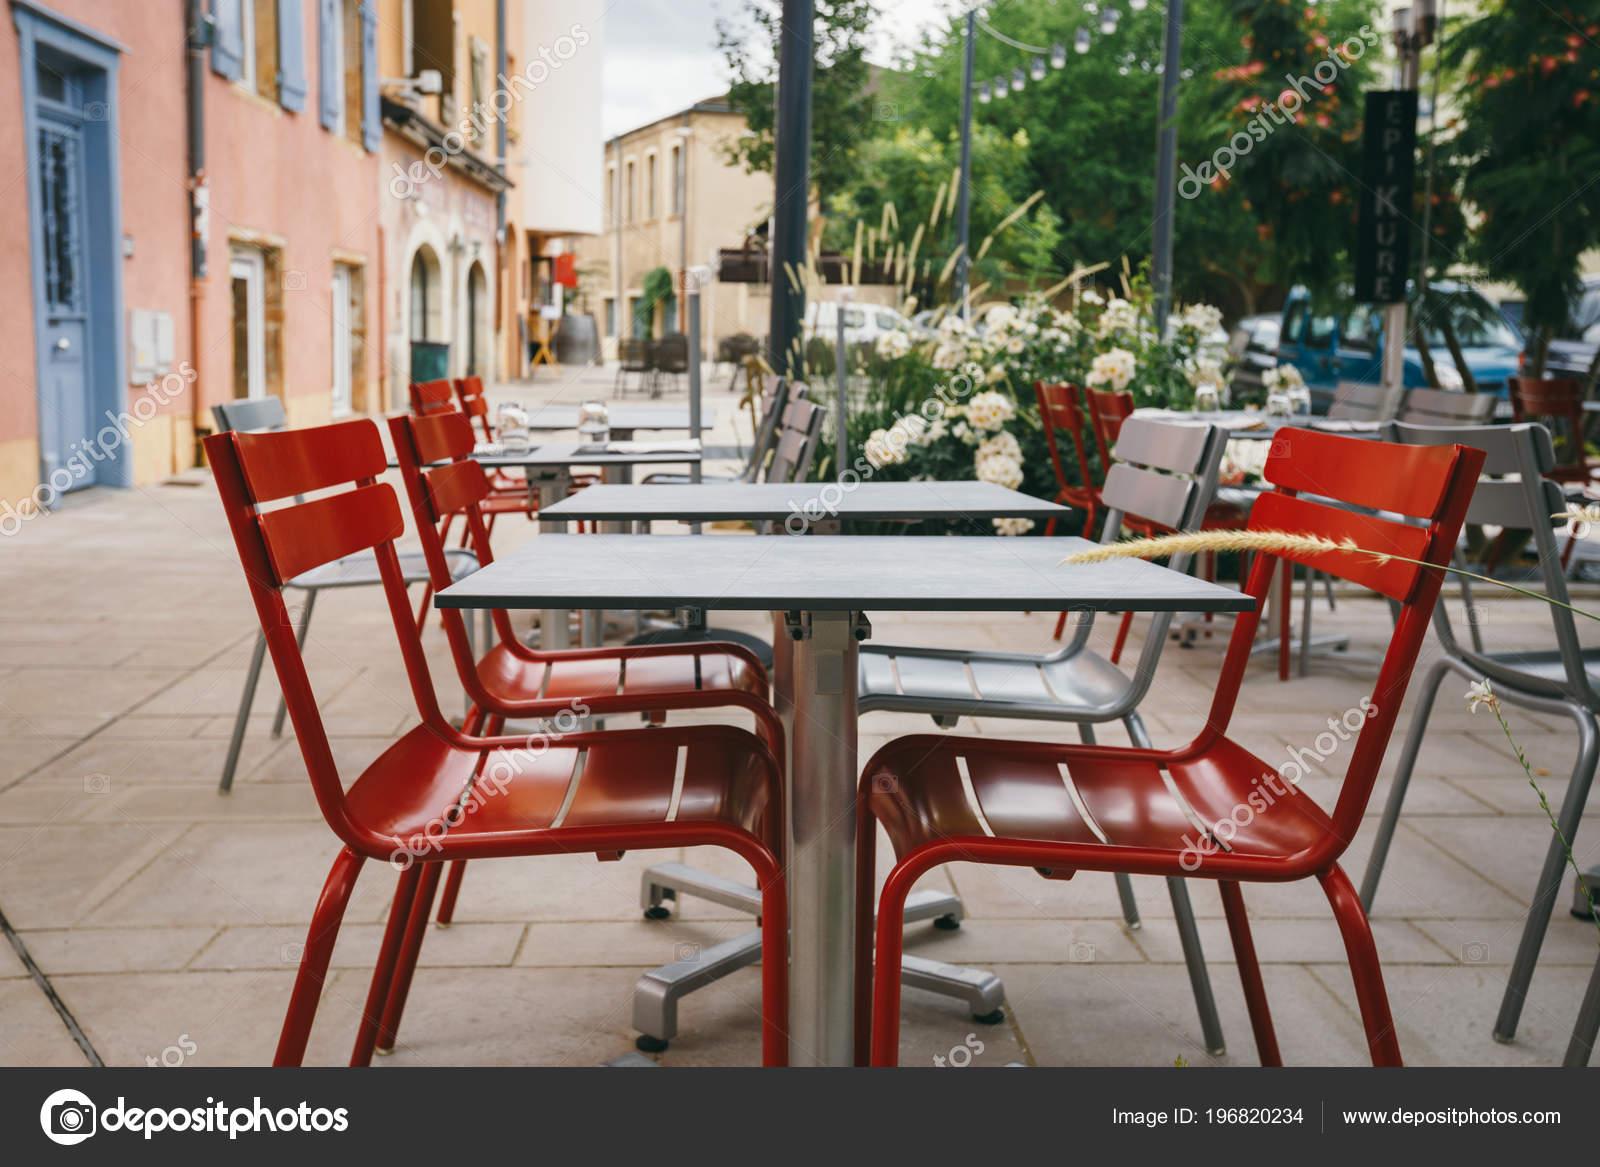 Theme Cafes Restaurants Exterior Summer Terrace Bright Colors Street Cafe Stock Photo C Veloliza 196820234